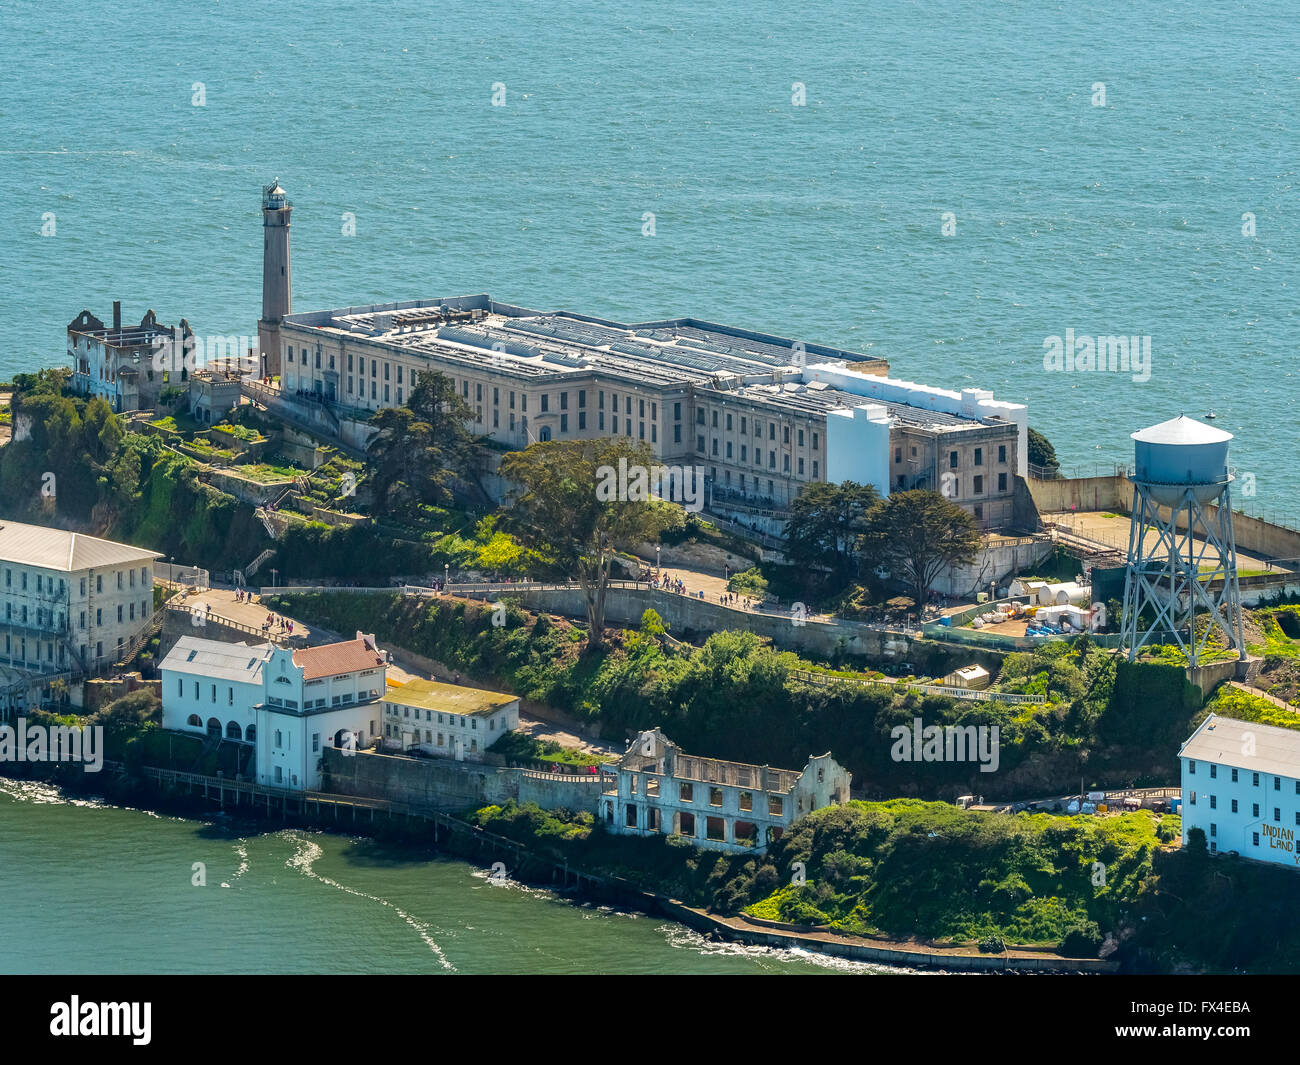 Luftaufnahme, Alcatraz, Alcatraz Island mit Leuchtturm, San Francisco, San Francisco Bay Area, Vereinigte Staaten Stockbild